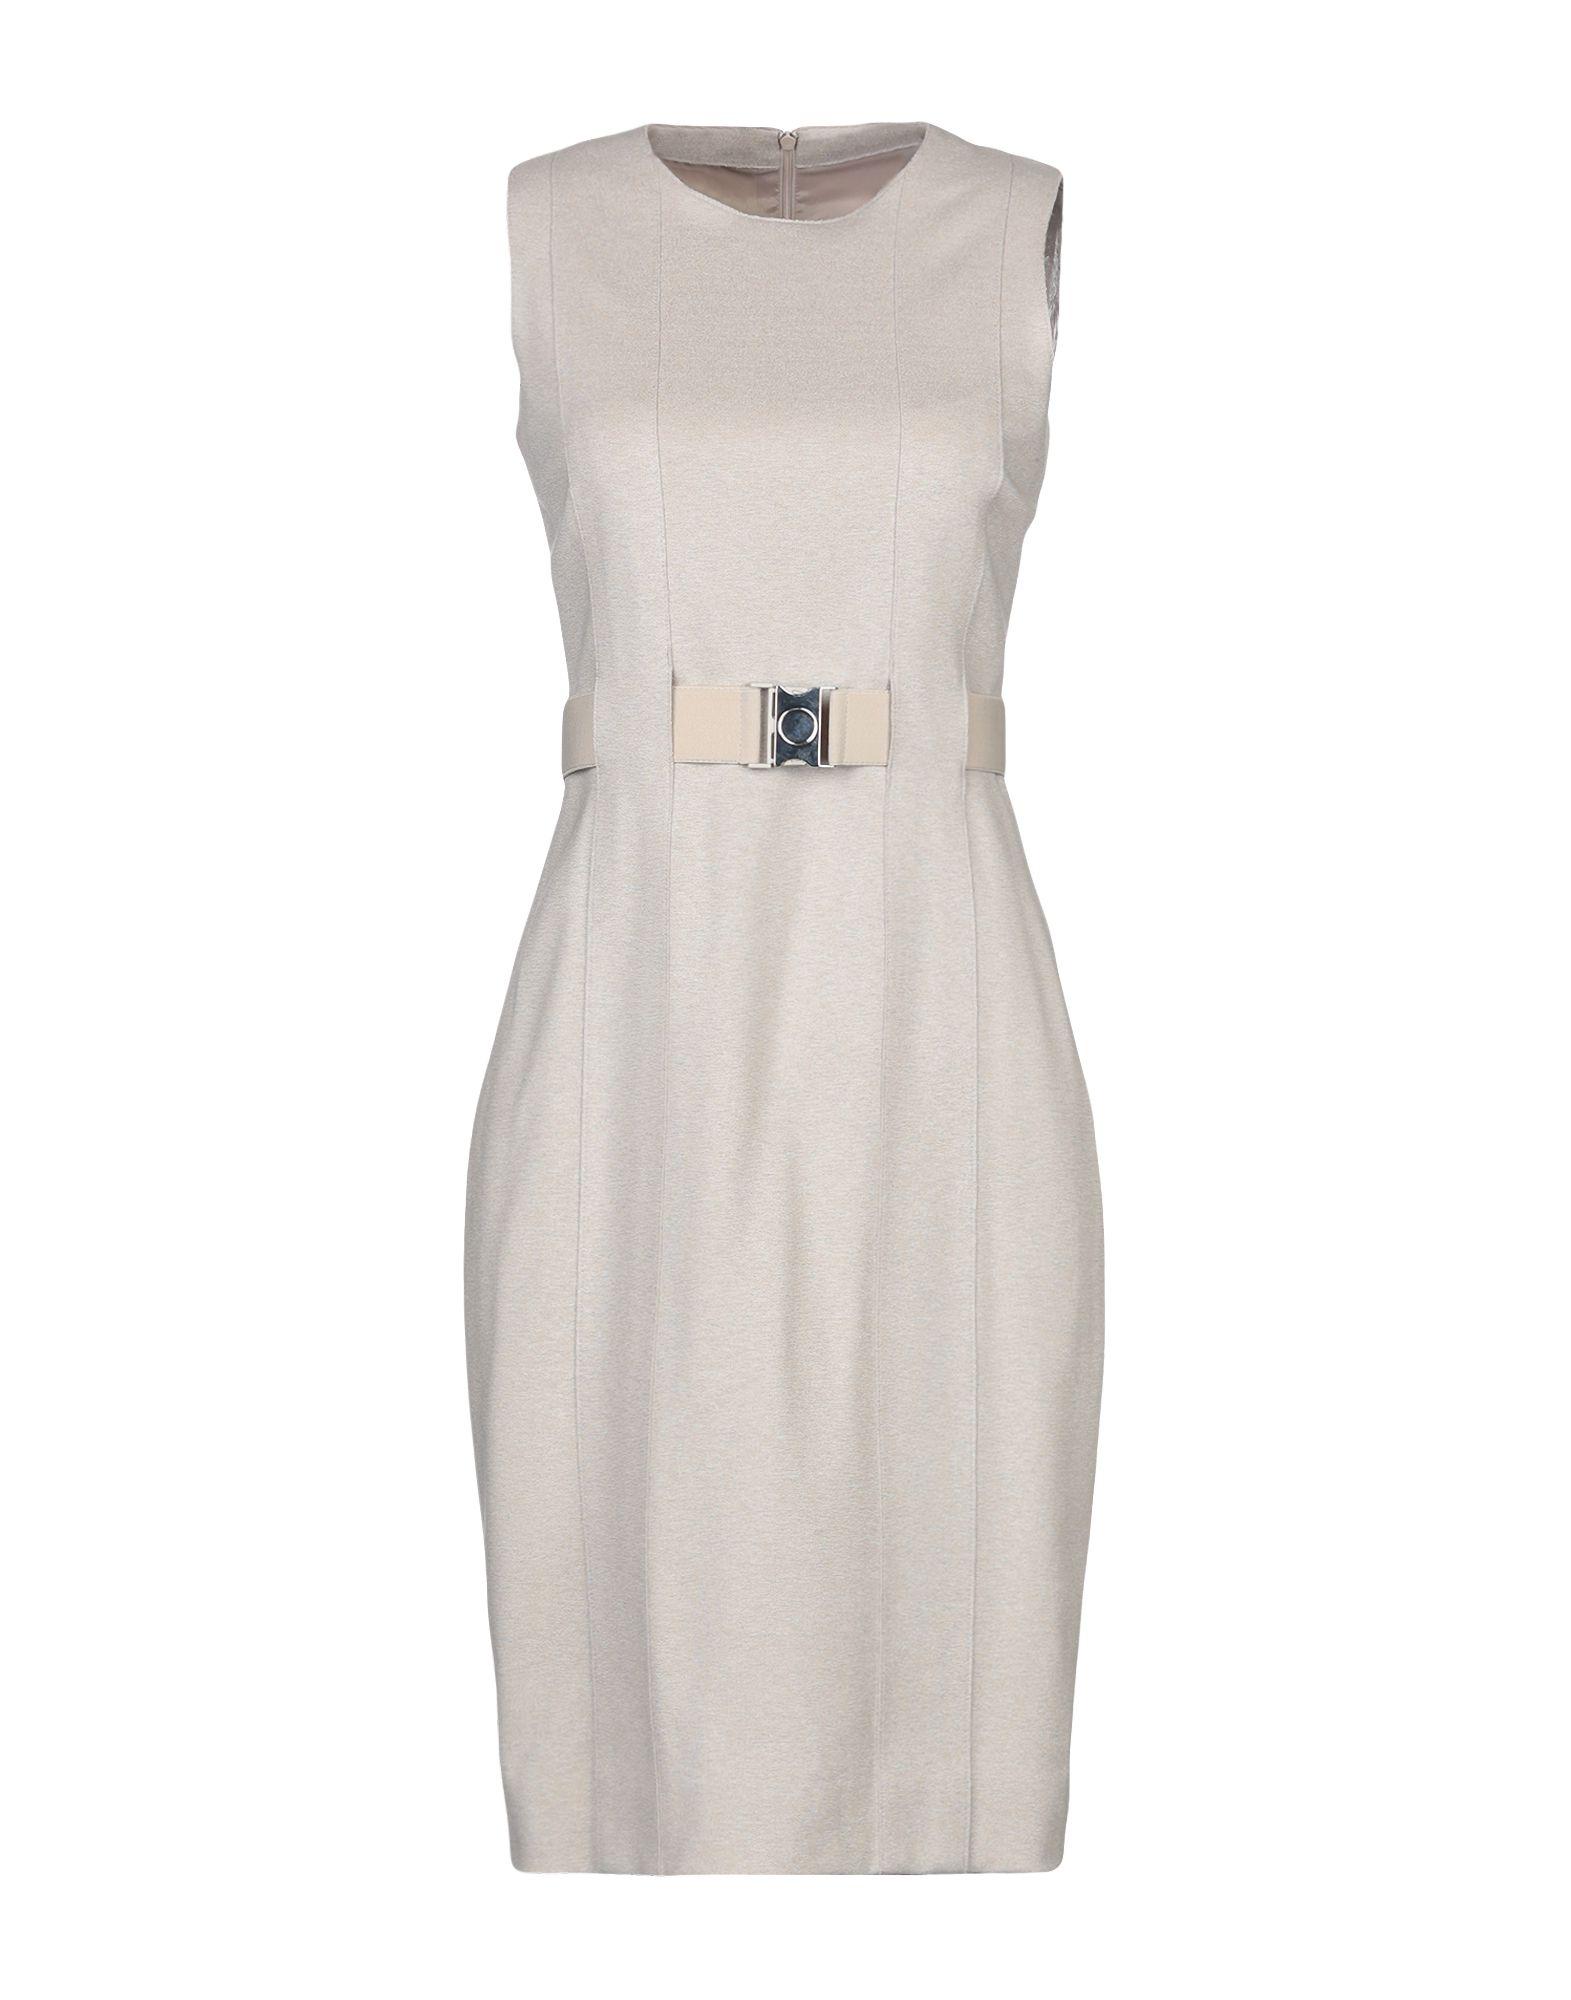 AKRIS PUNTO Knee-length dresses. jersey, belt, solid color, round collar, sleeveless, rear closure, zip, fully lined, stretch. 70% Viscose, 25% Polyamide, 5% Elastane